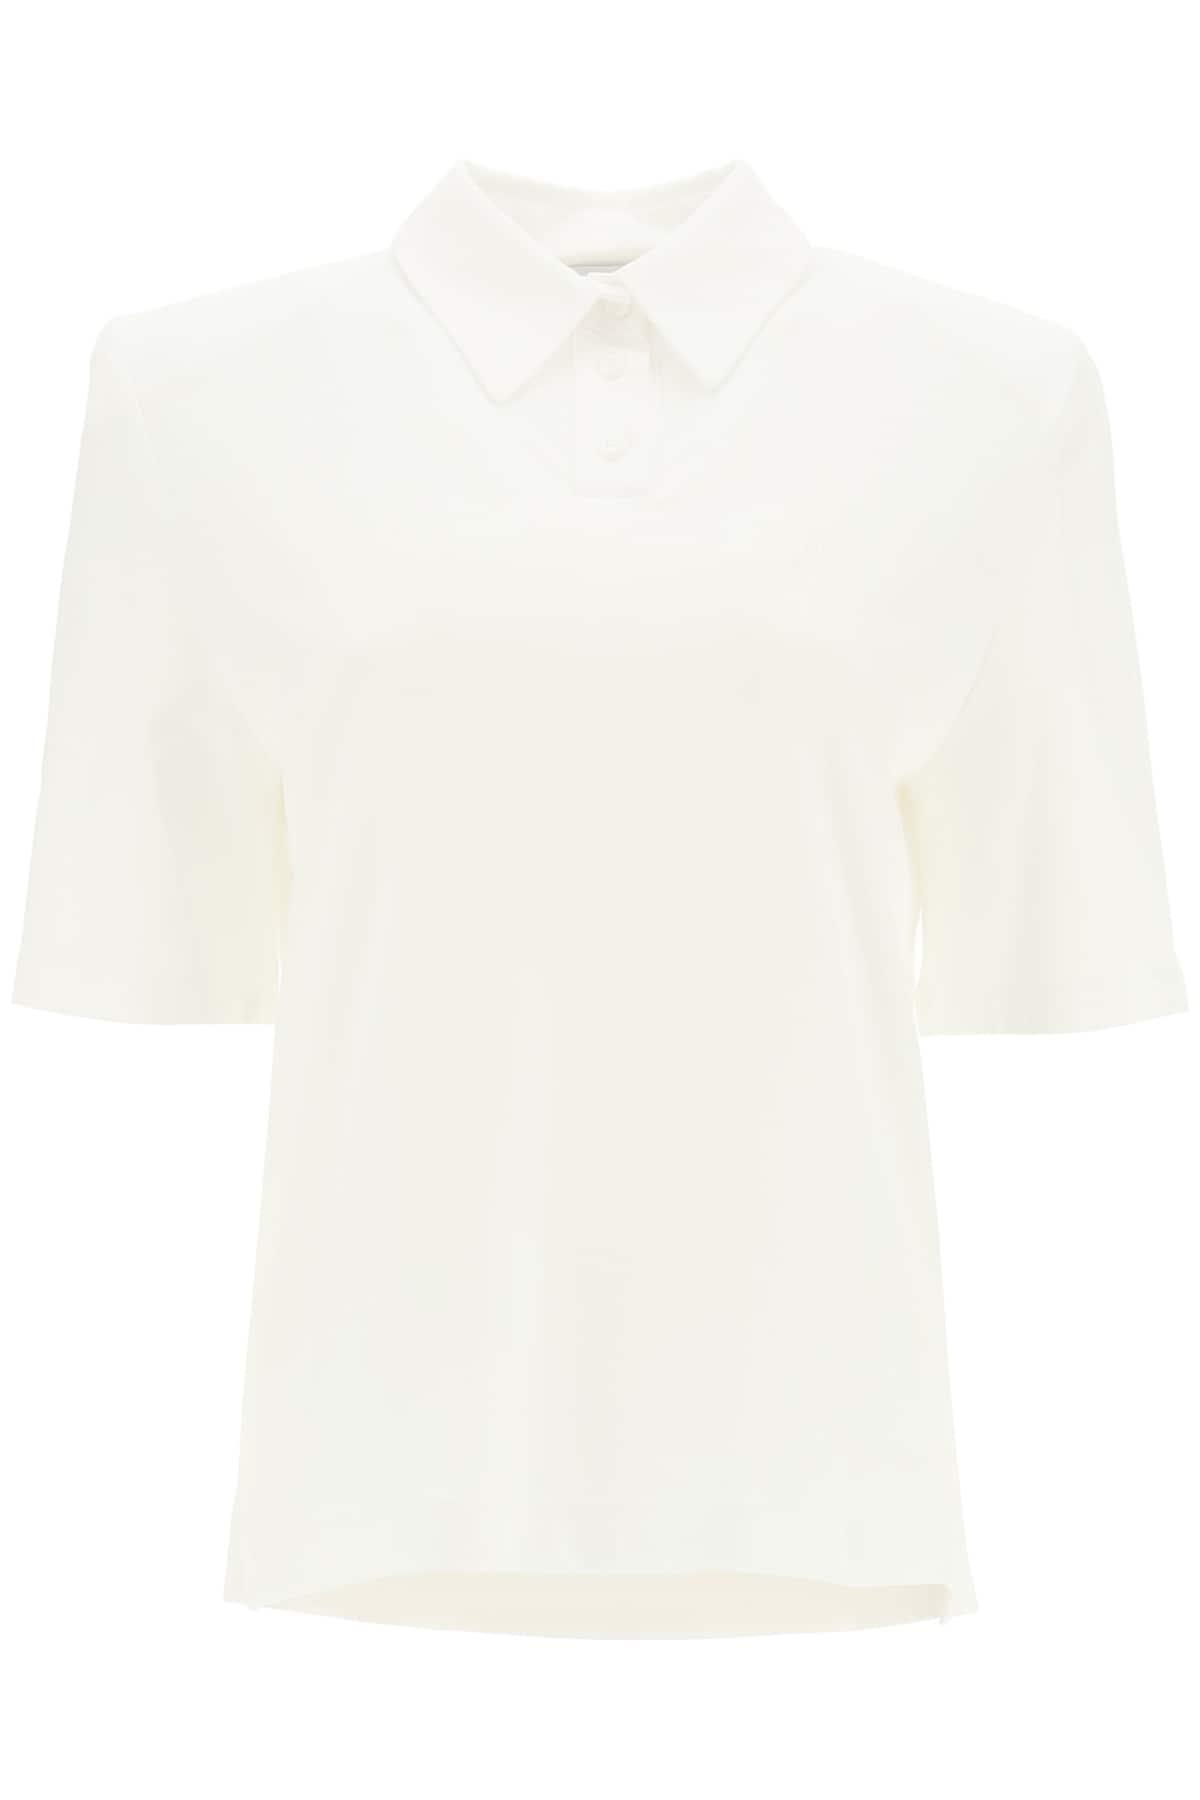 THE ATTICO ASTRID POLO SHIRT WITH LOGO EMBROIDERY 38 White Cotton